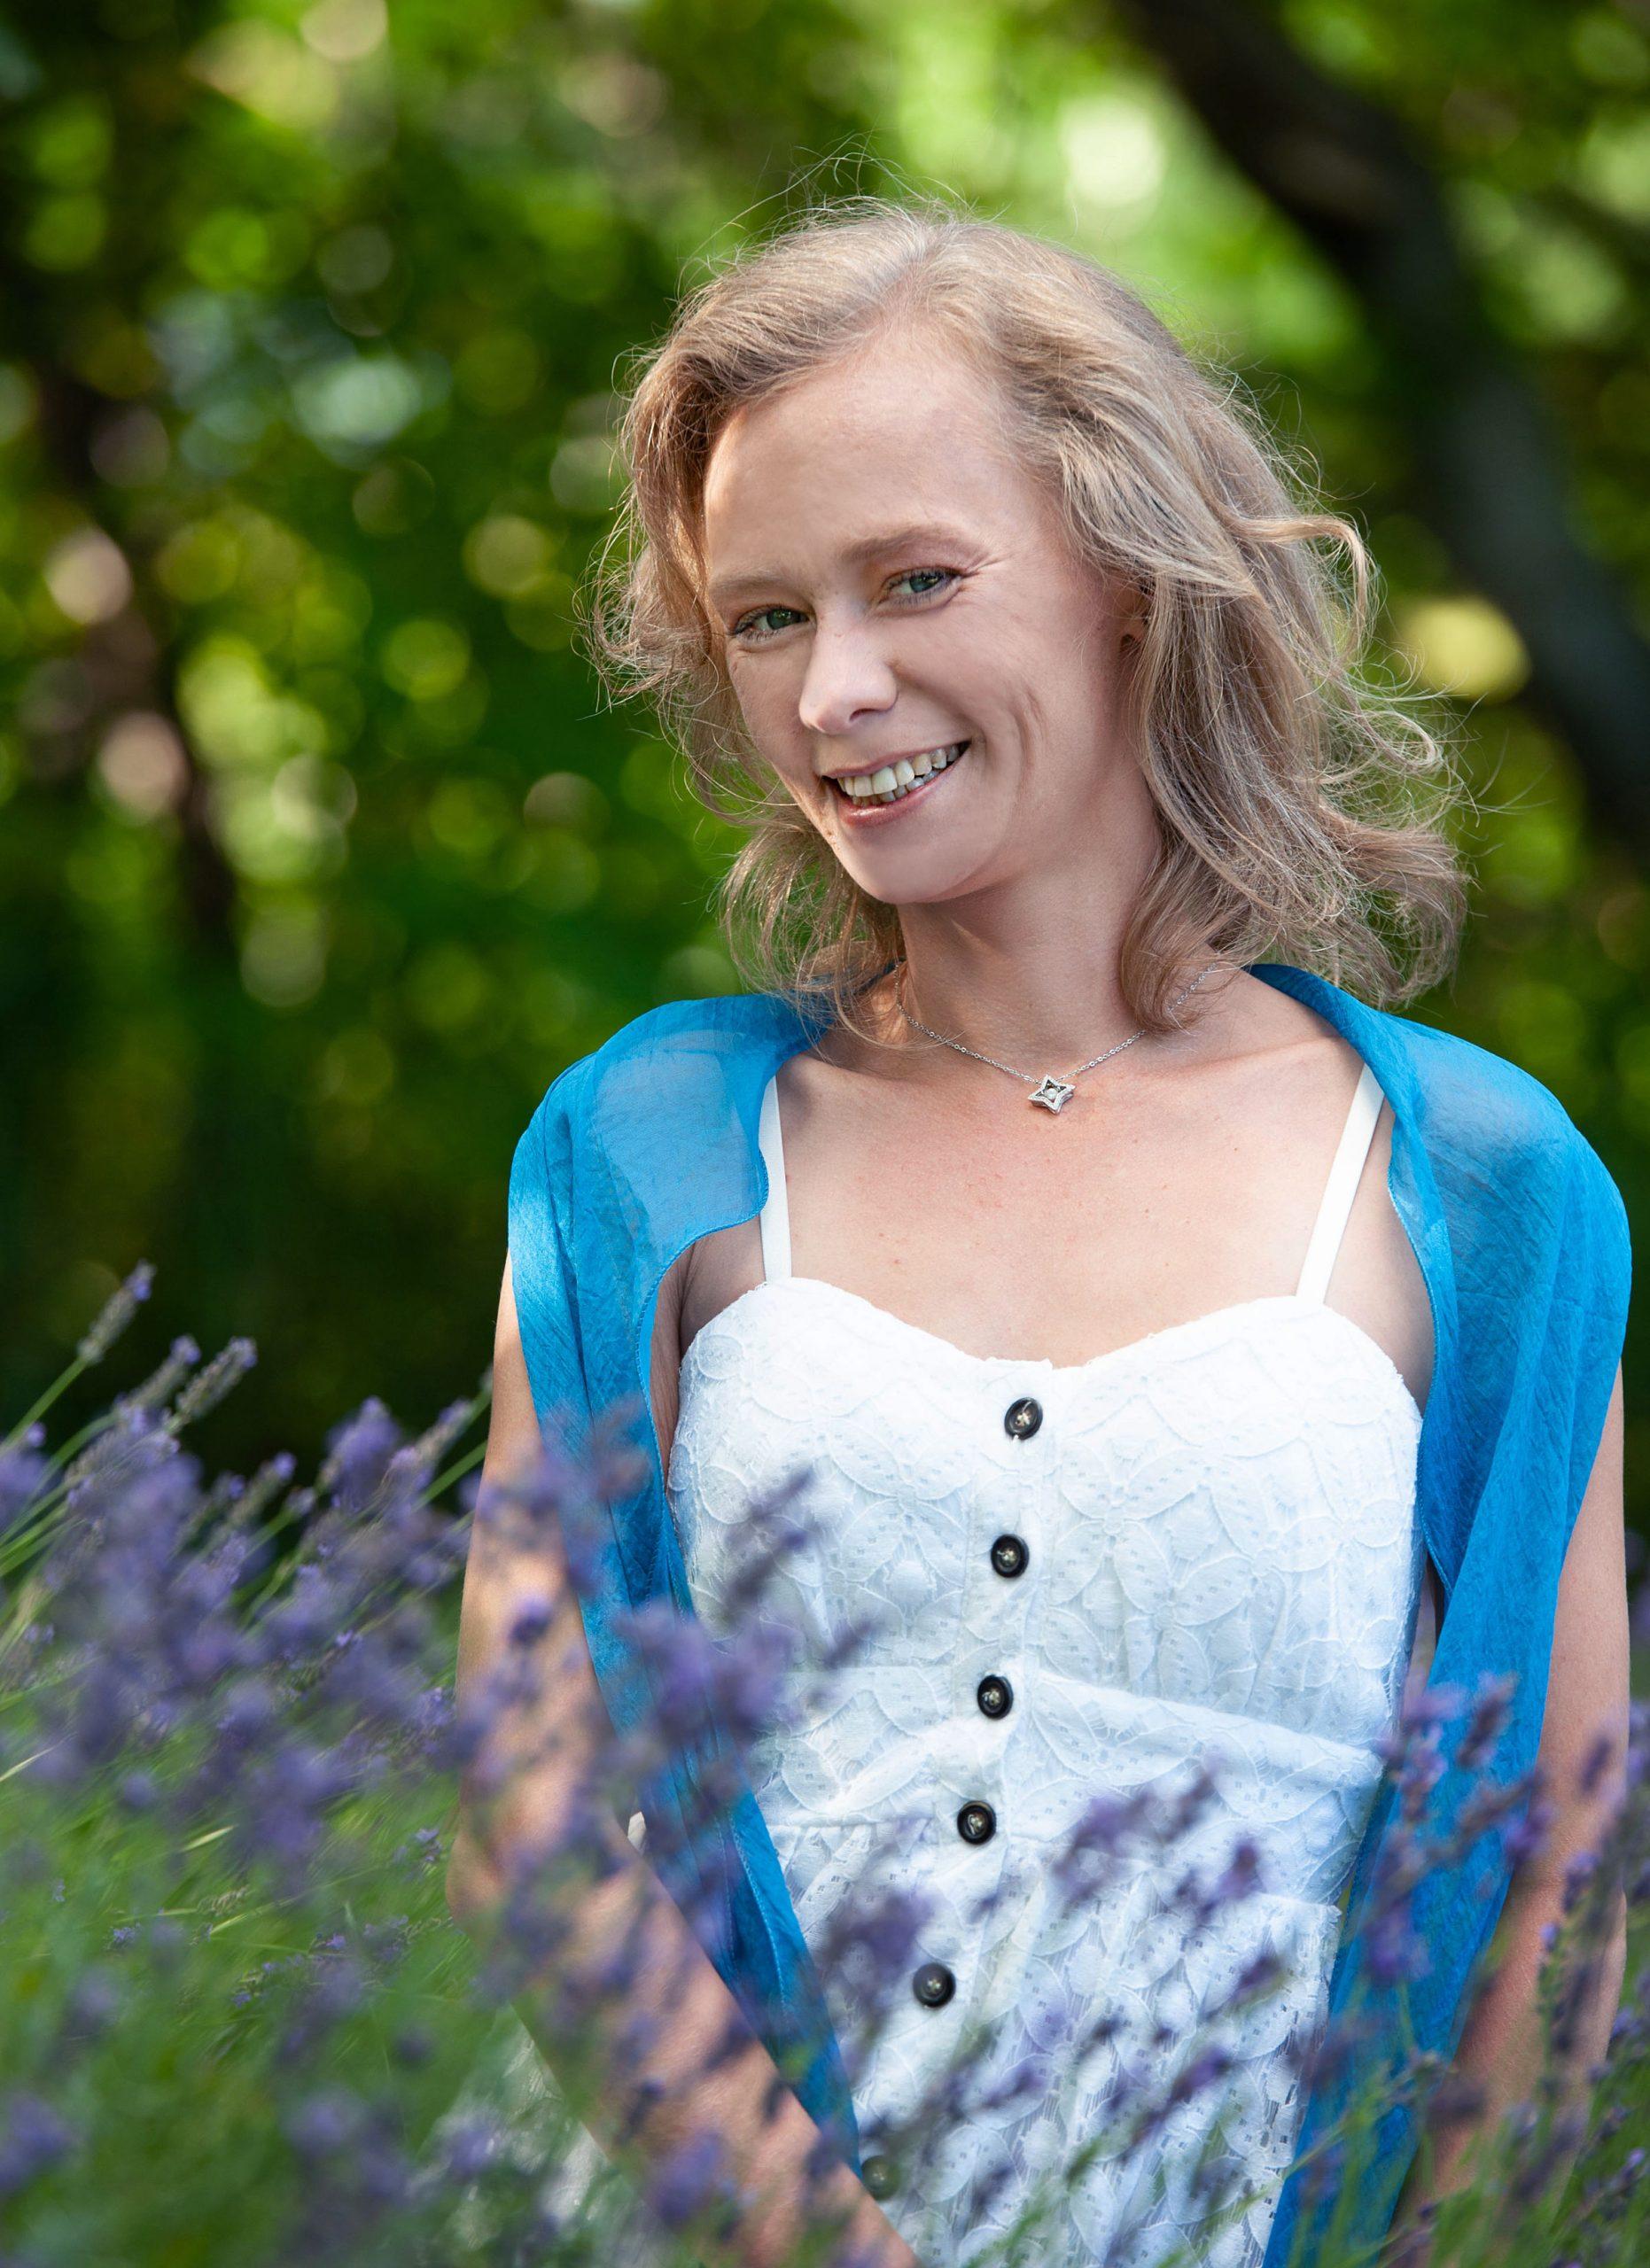 Introducing our President & CEO: Niina Felushko